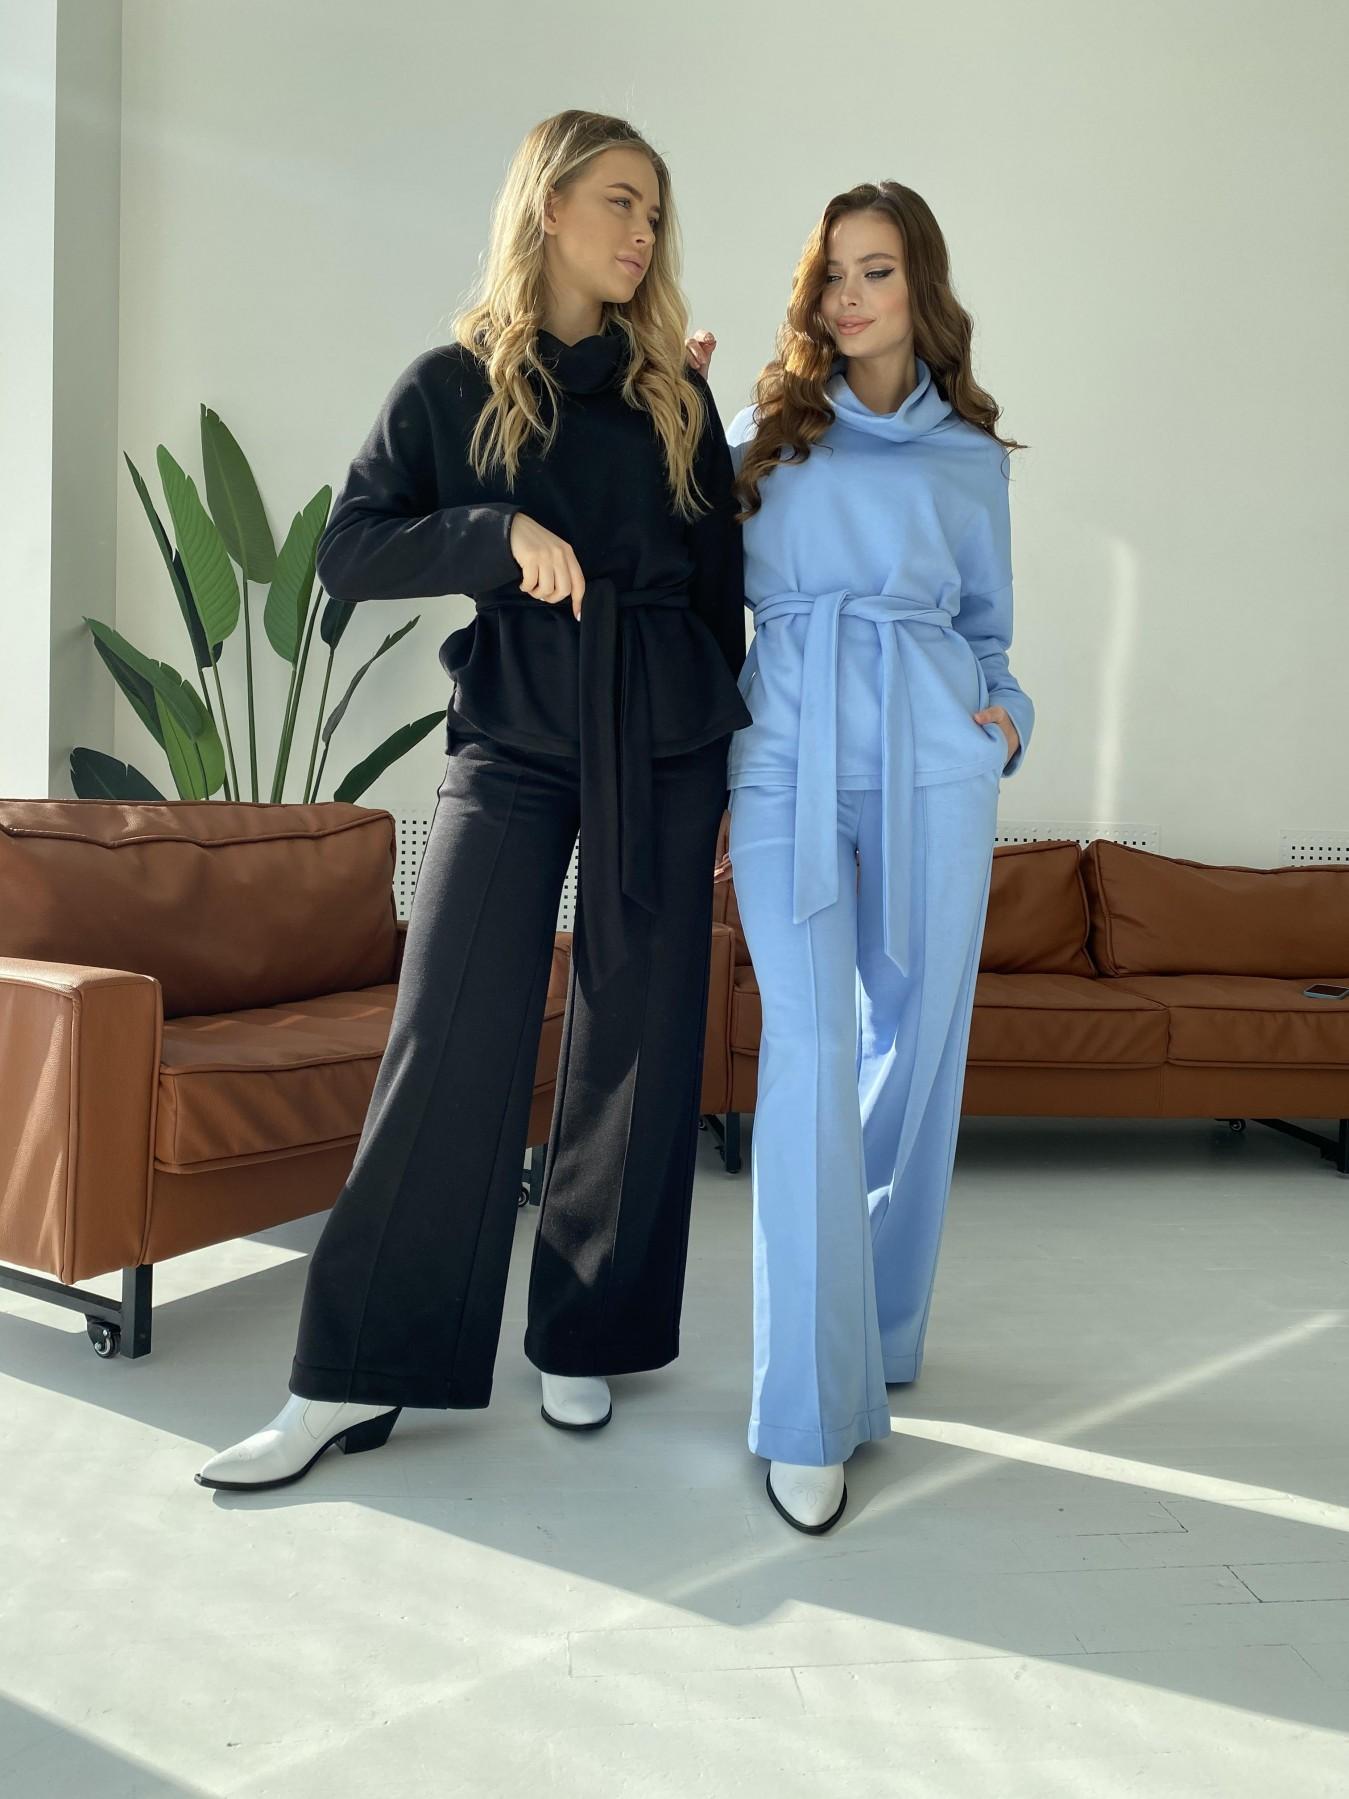 Джаст костюм Oversize  3х нитка 10564 АРТ. 47245 Цвет: Голубой - фото 7, интернет магазин tm-modus.ru